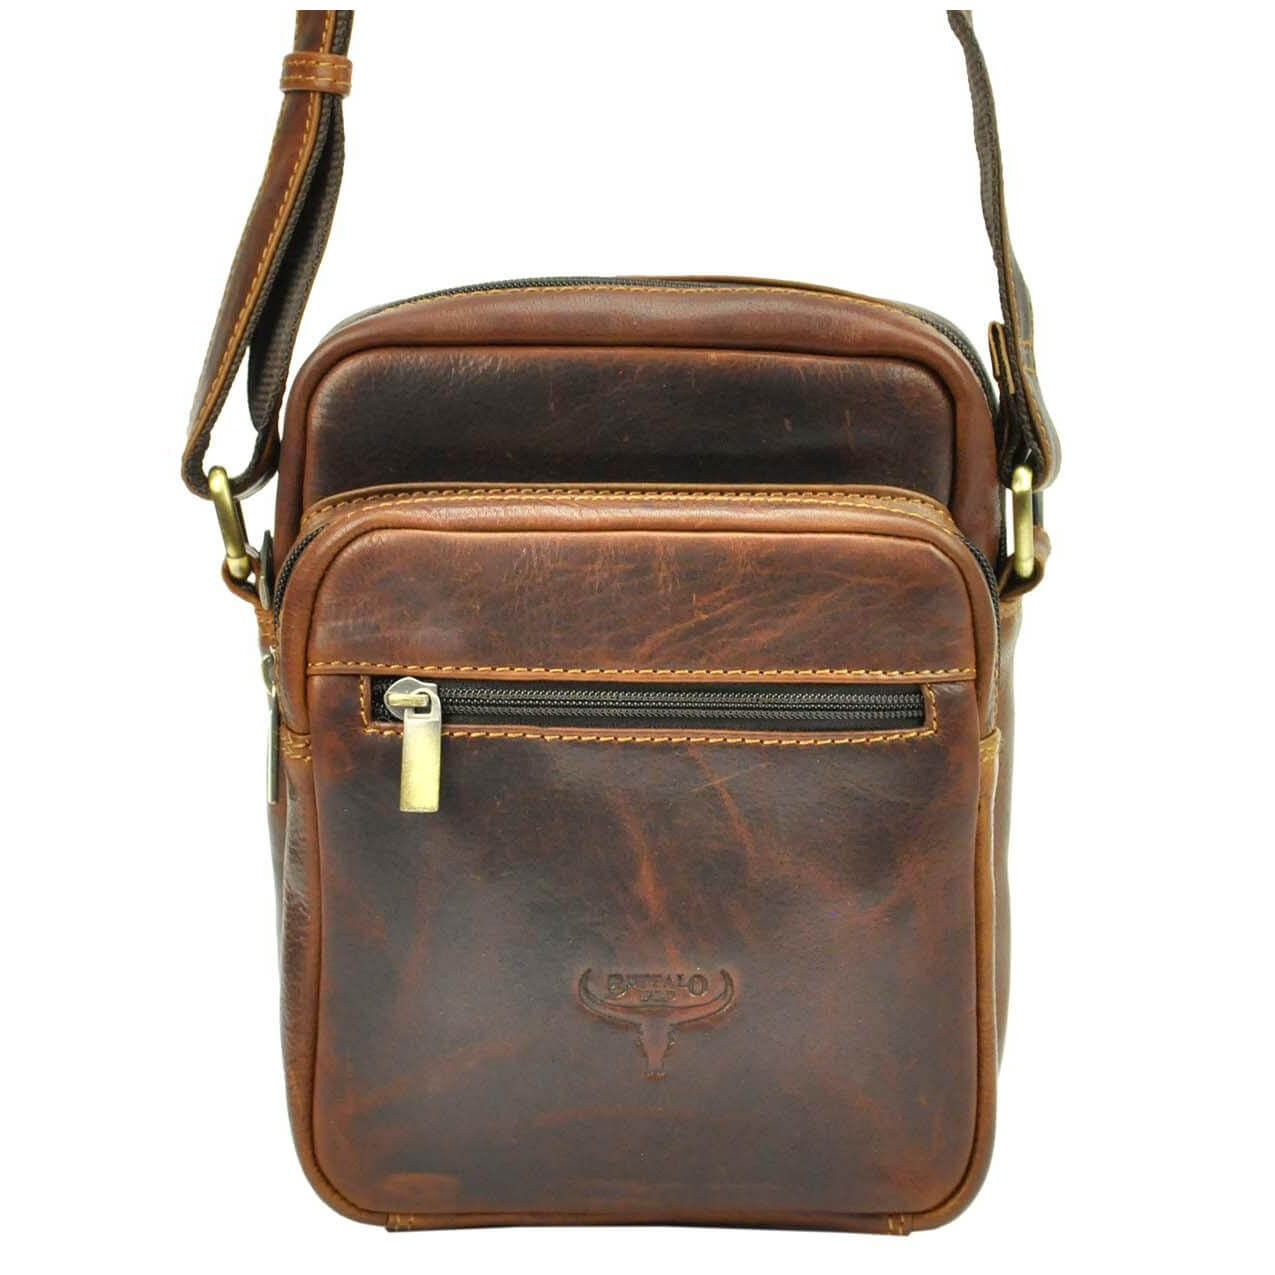 Pánská taška přes rameno Buffalo Wild Quido - hnedá